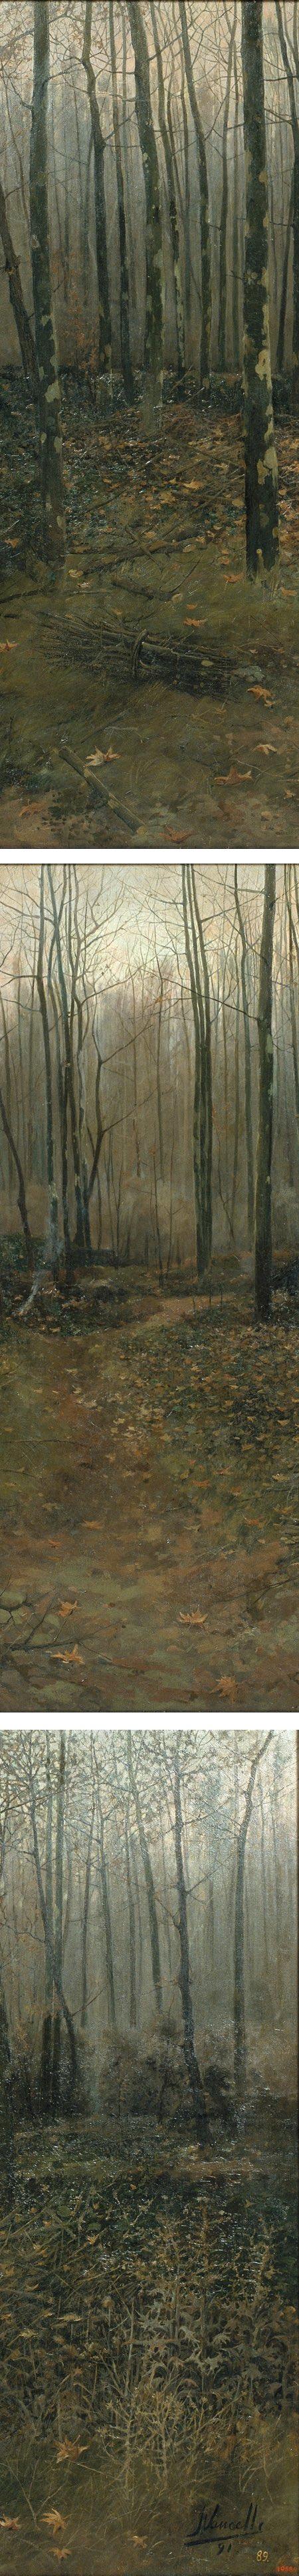 February, Joaquim Vancells, landscape painting, details